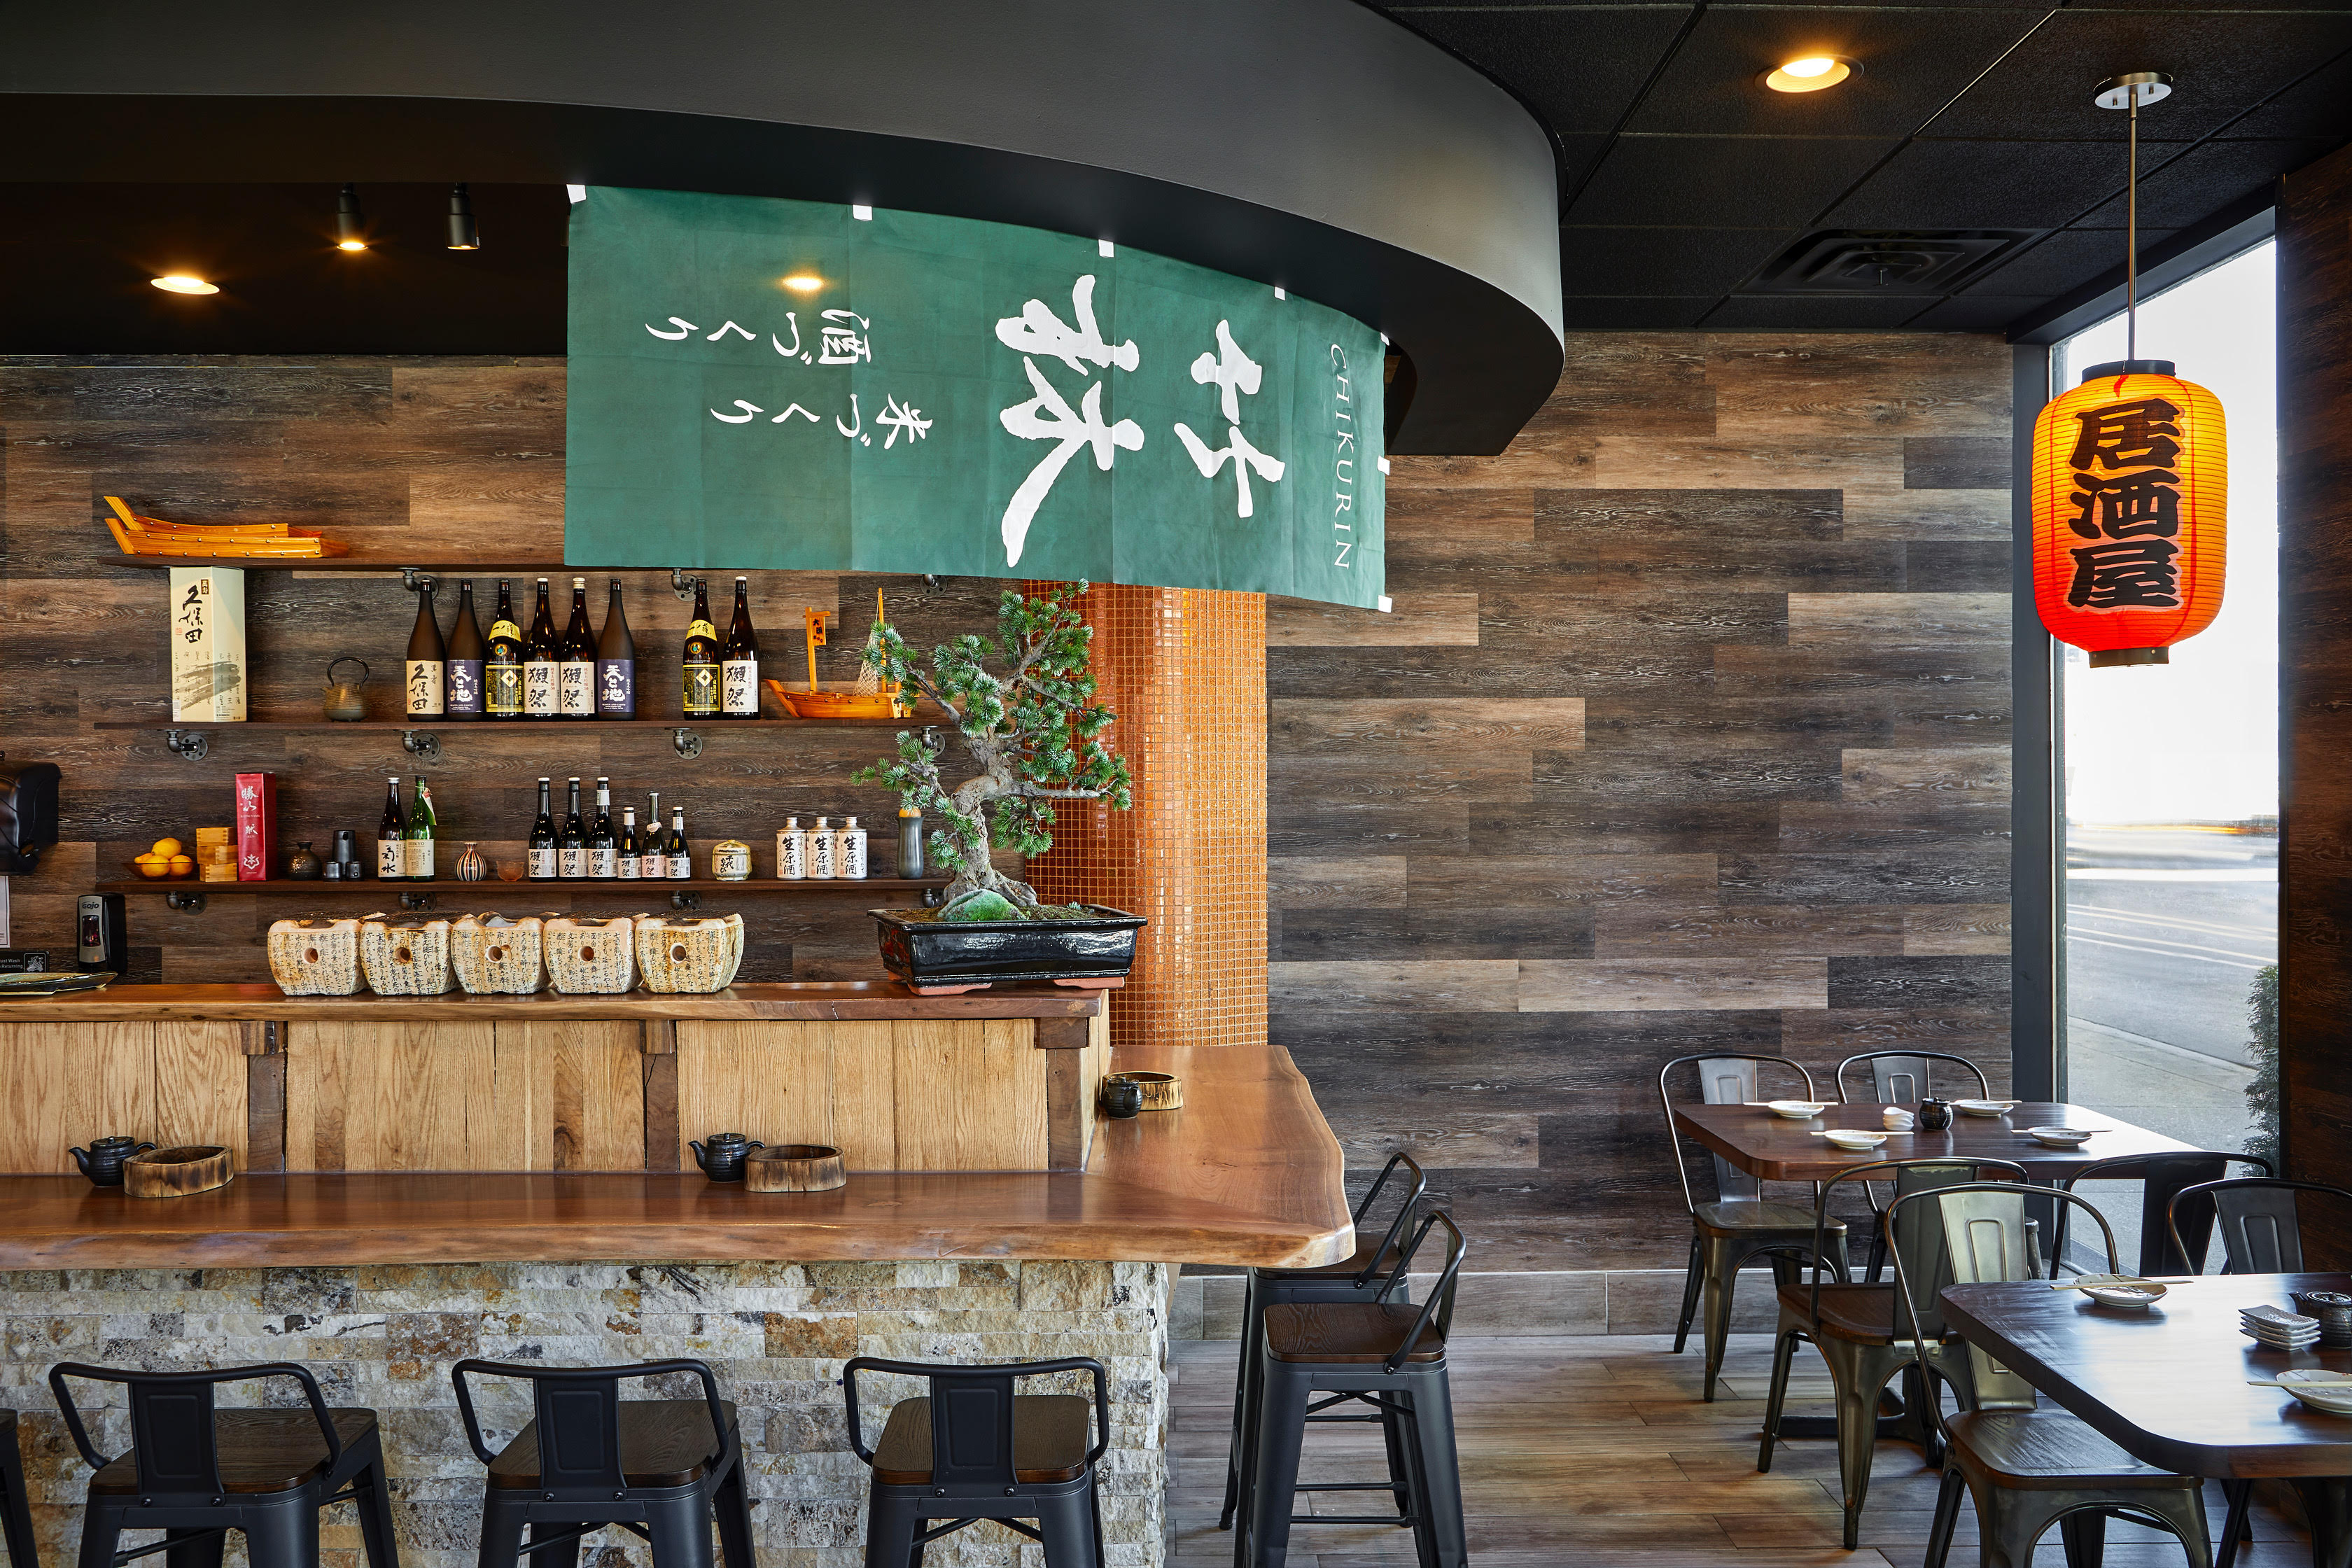 The inside of an izakaya-style bar.